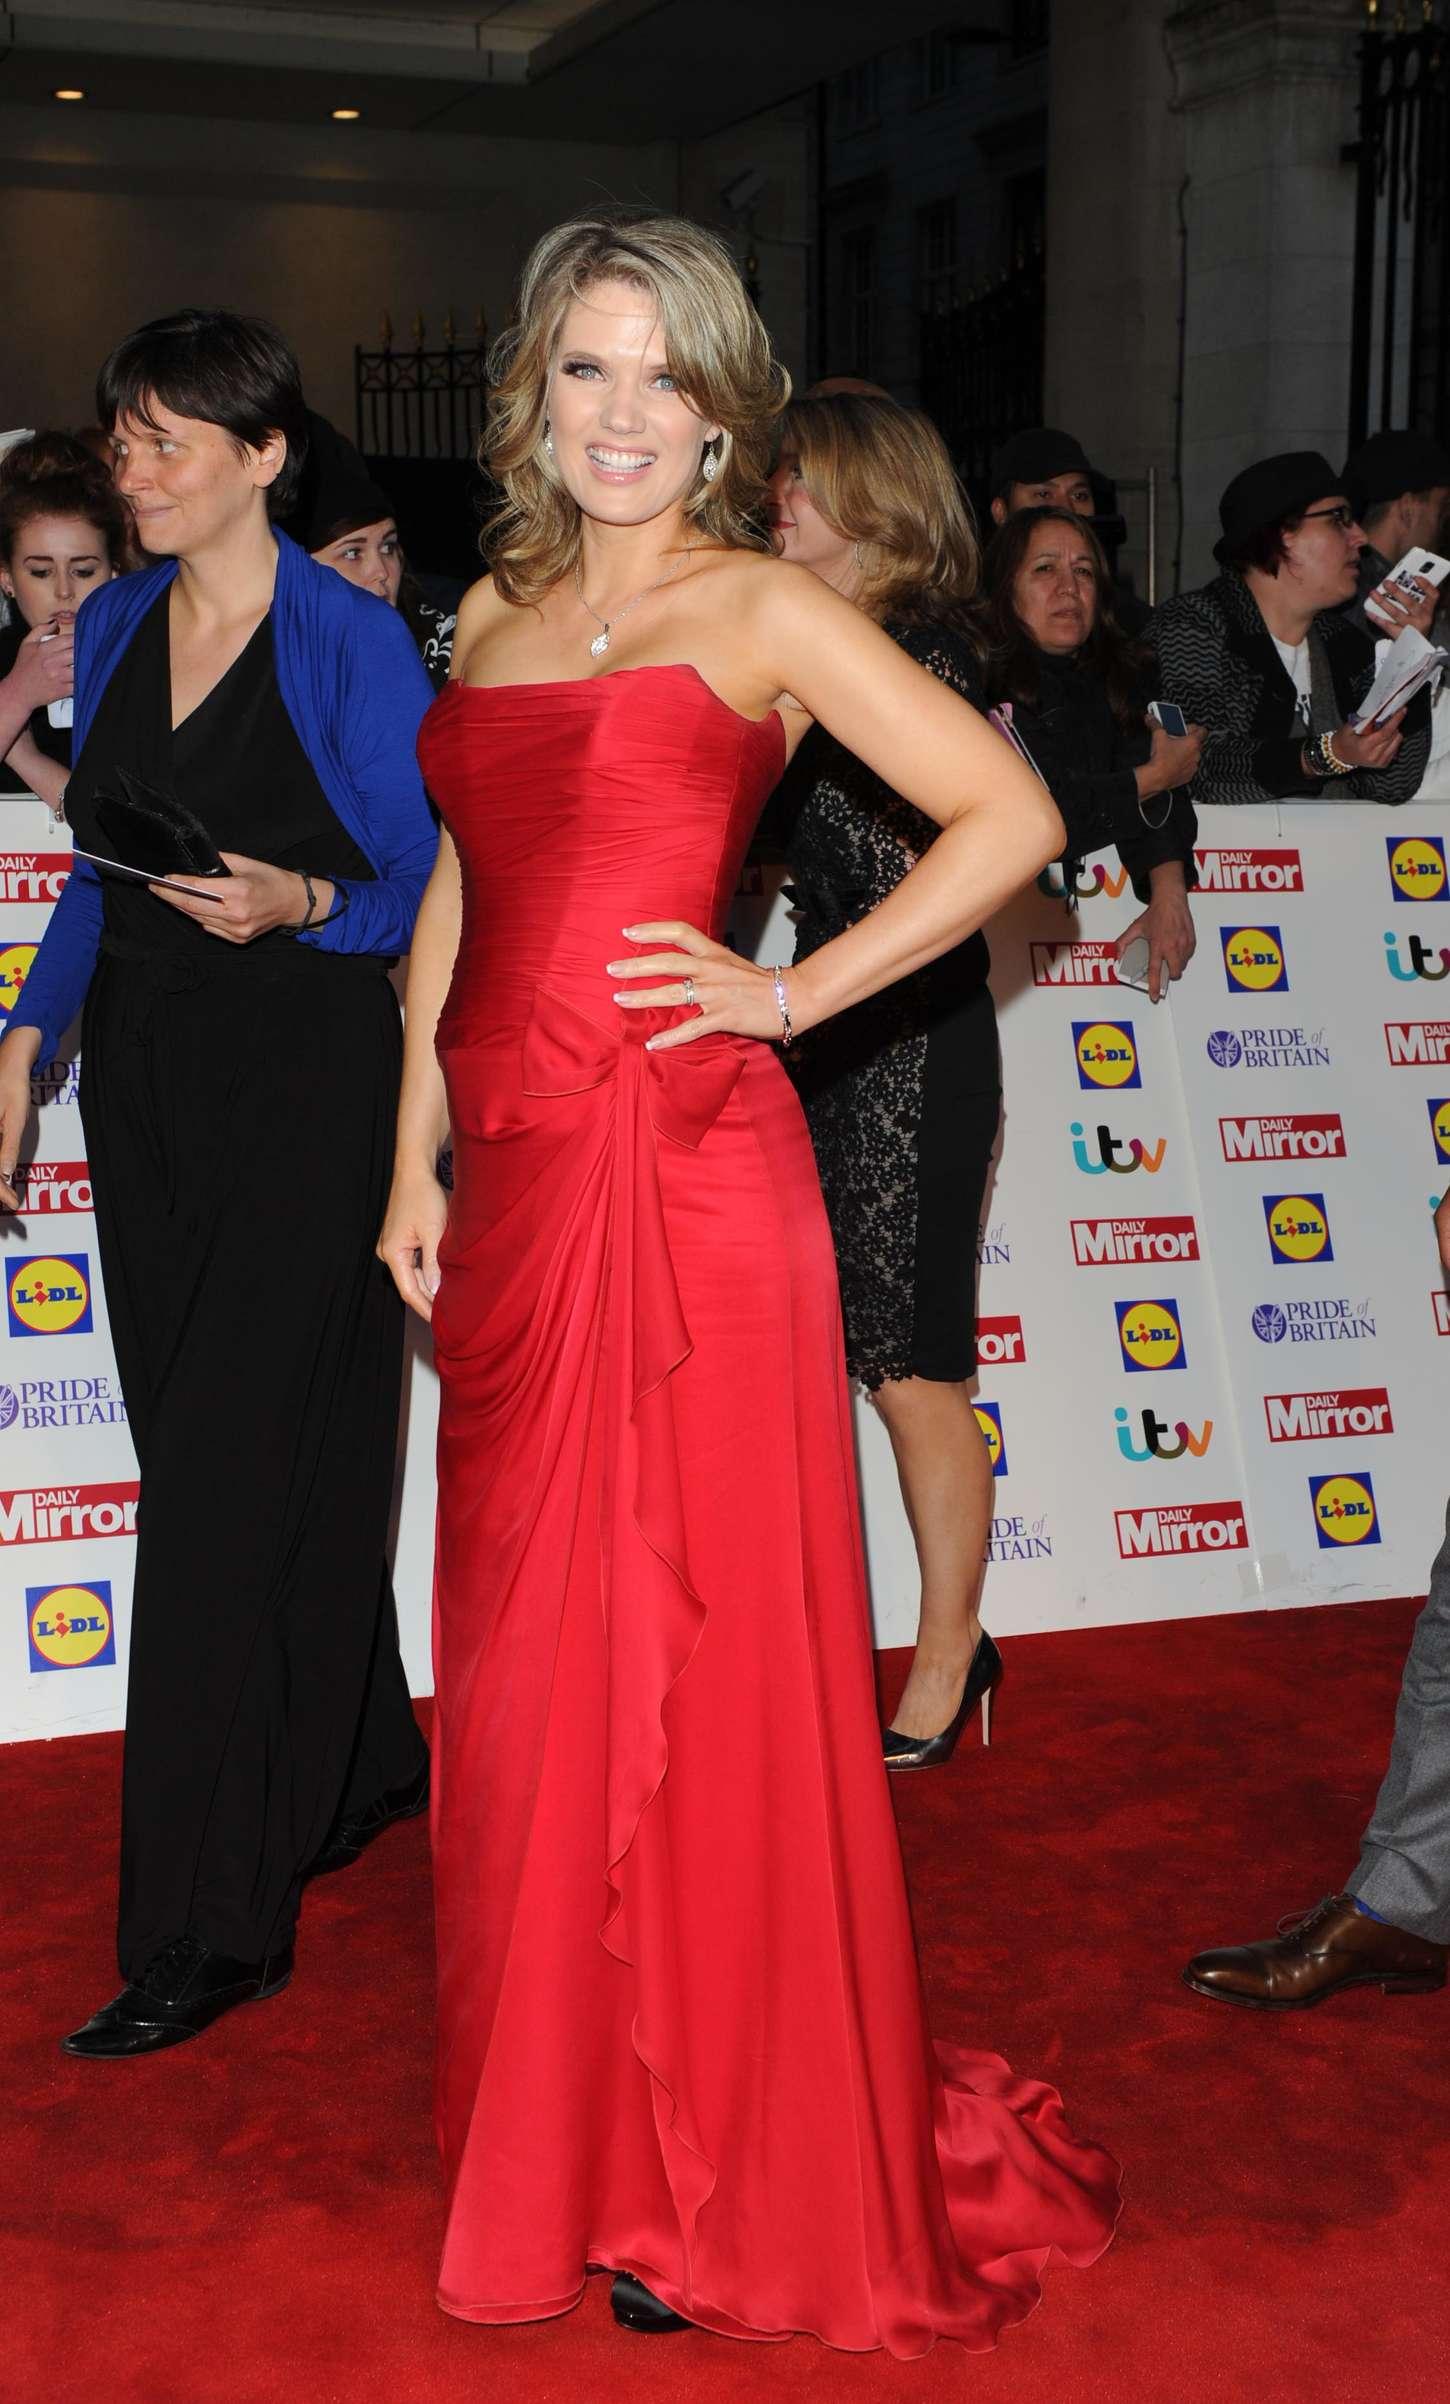 Charlotte Hawkins Pride of Britain Awards in London